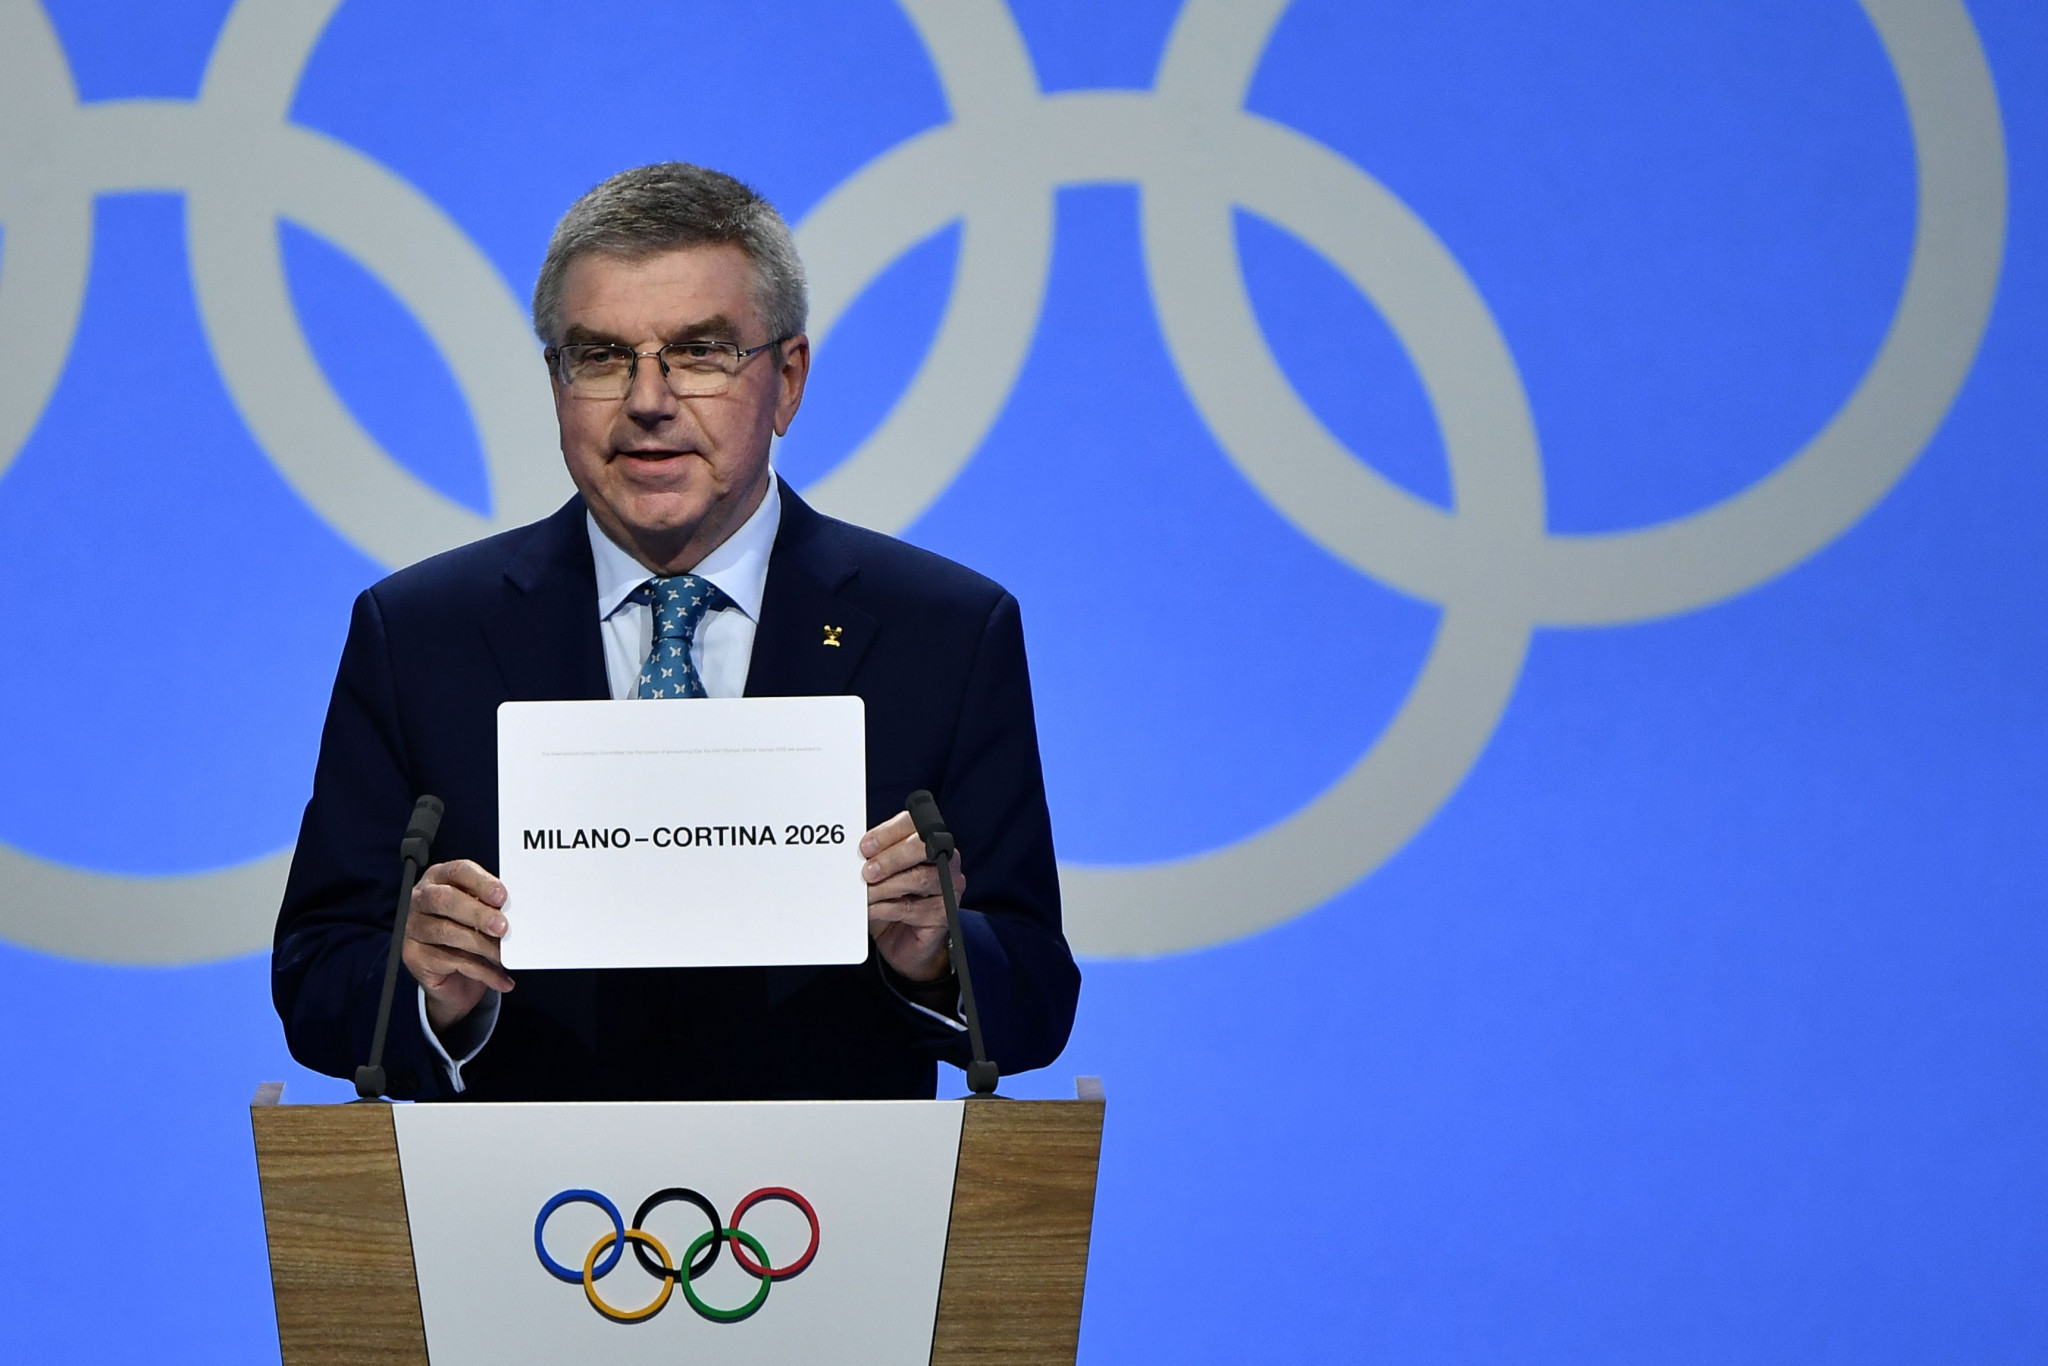 Milan-Cortina 2026 celebrates one year anniversary of Winter Games award